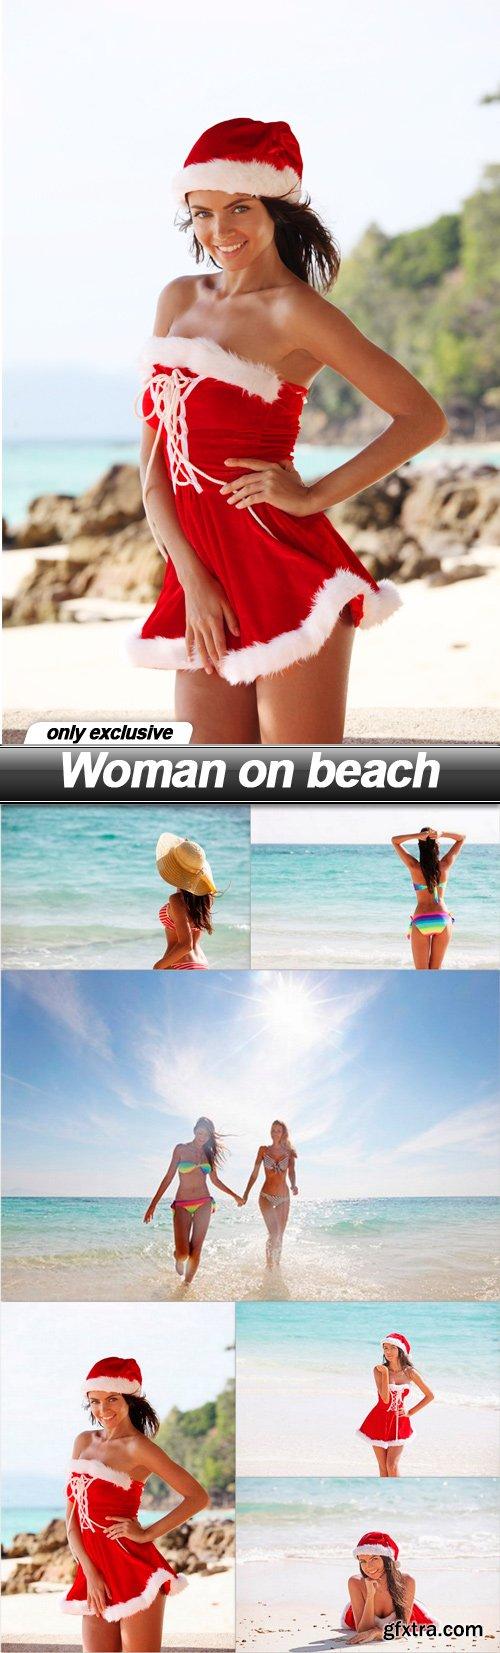 Woman on beach - 6 UHQ JPEG